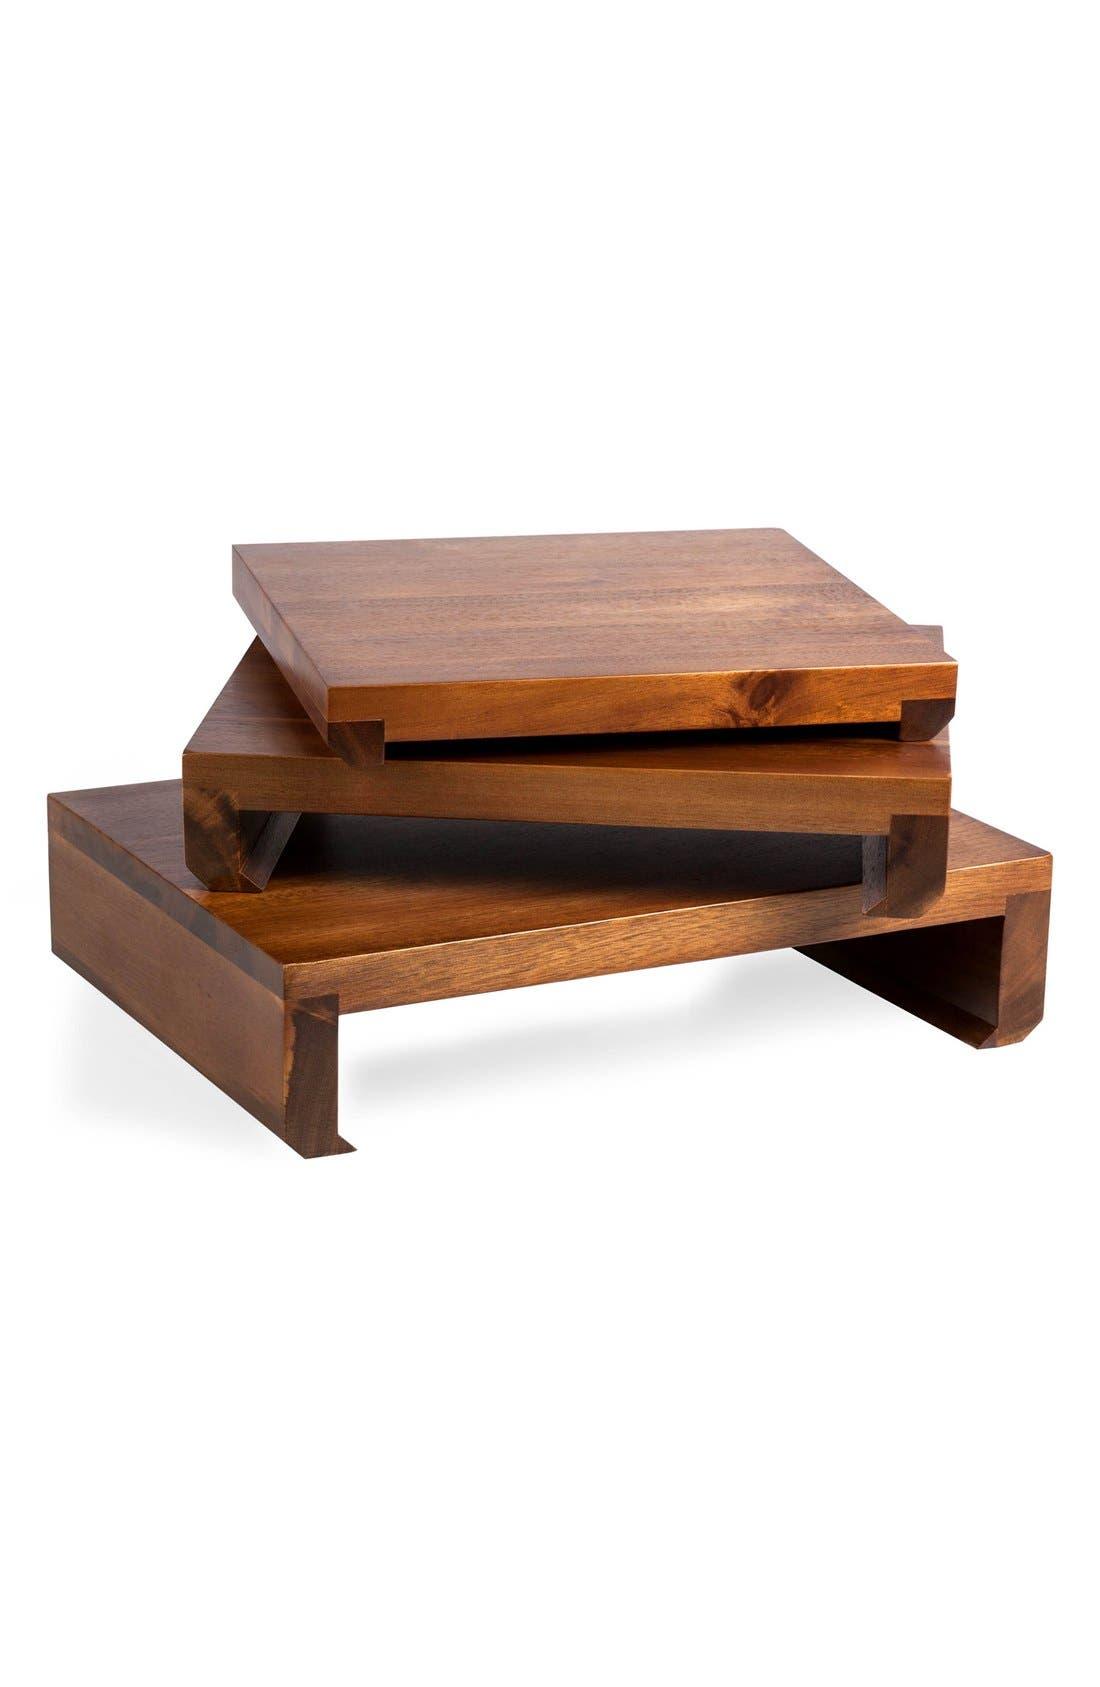 'Etage' Wood Serving Pedestals,                         Main,                         color, 200